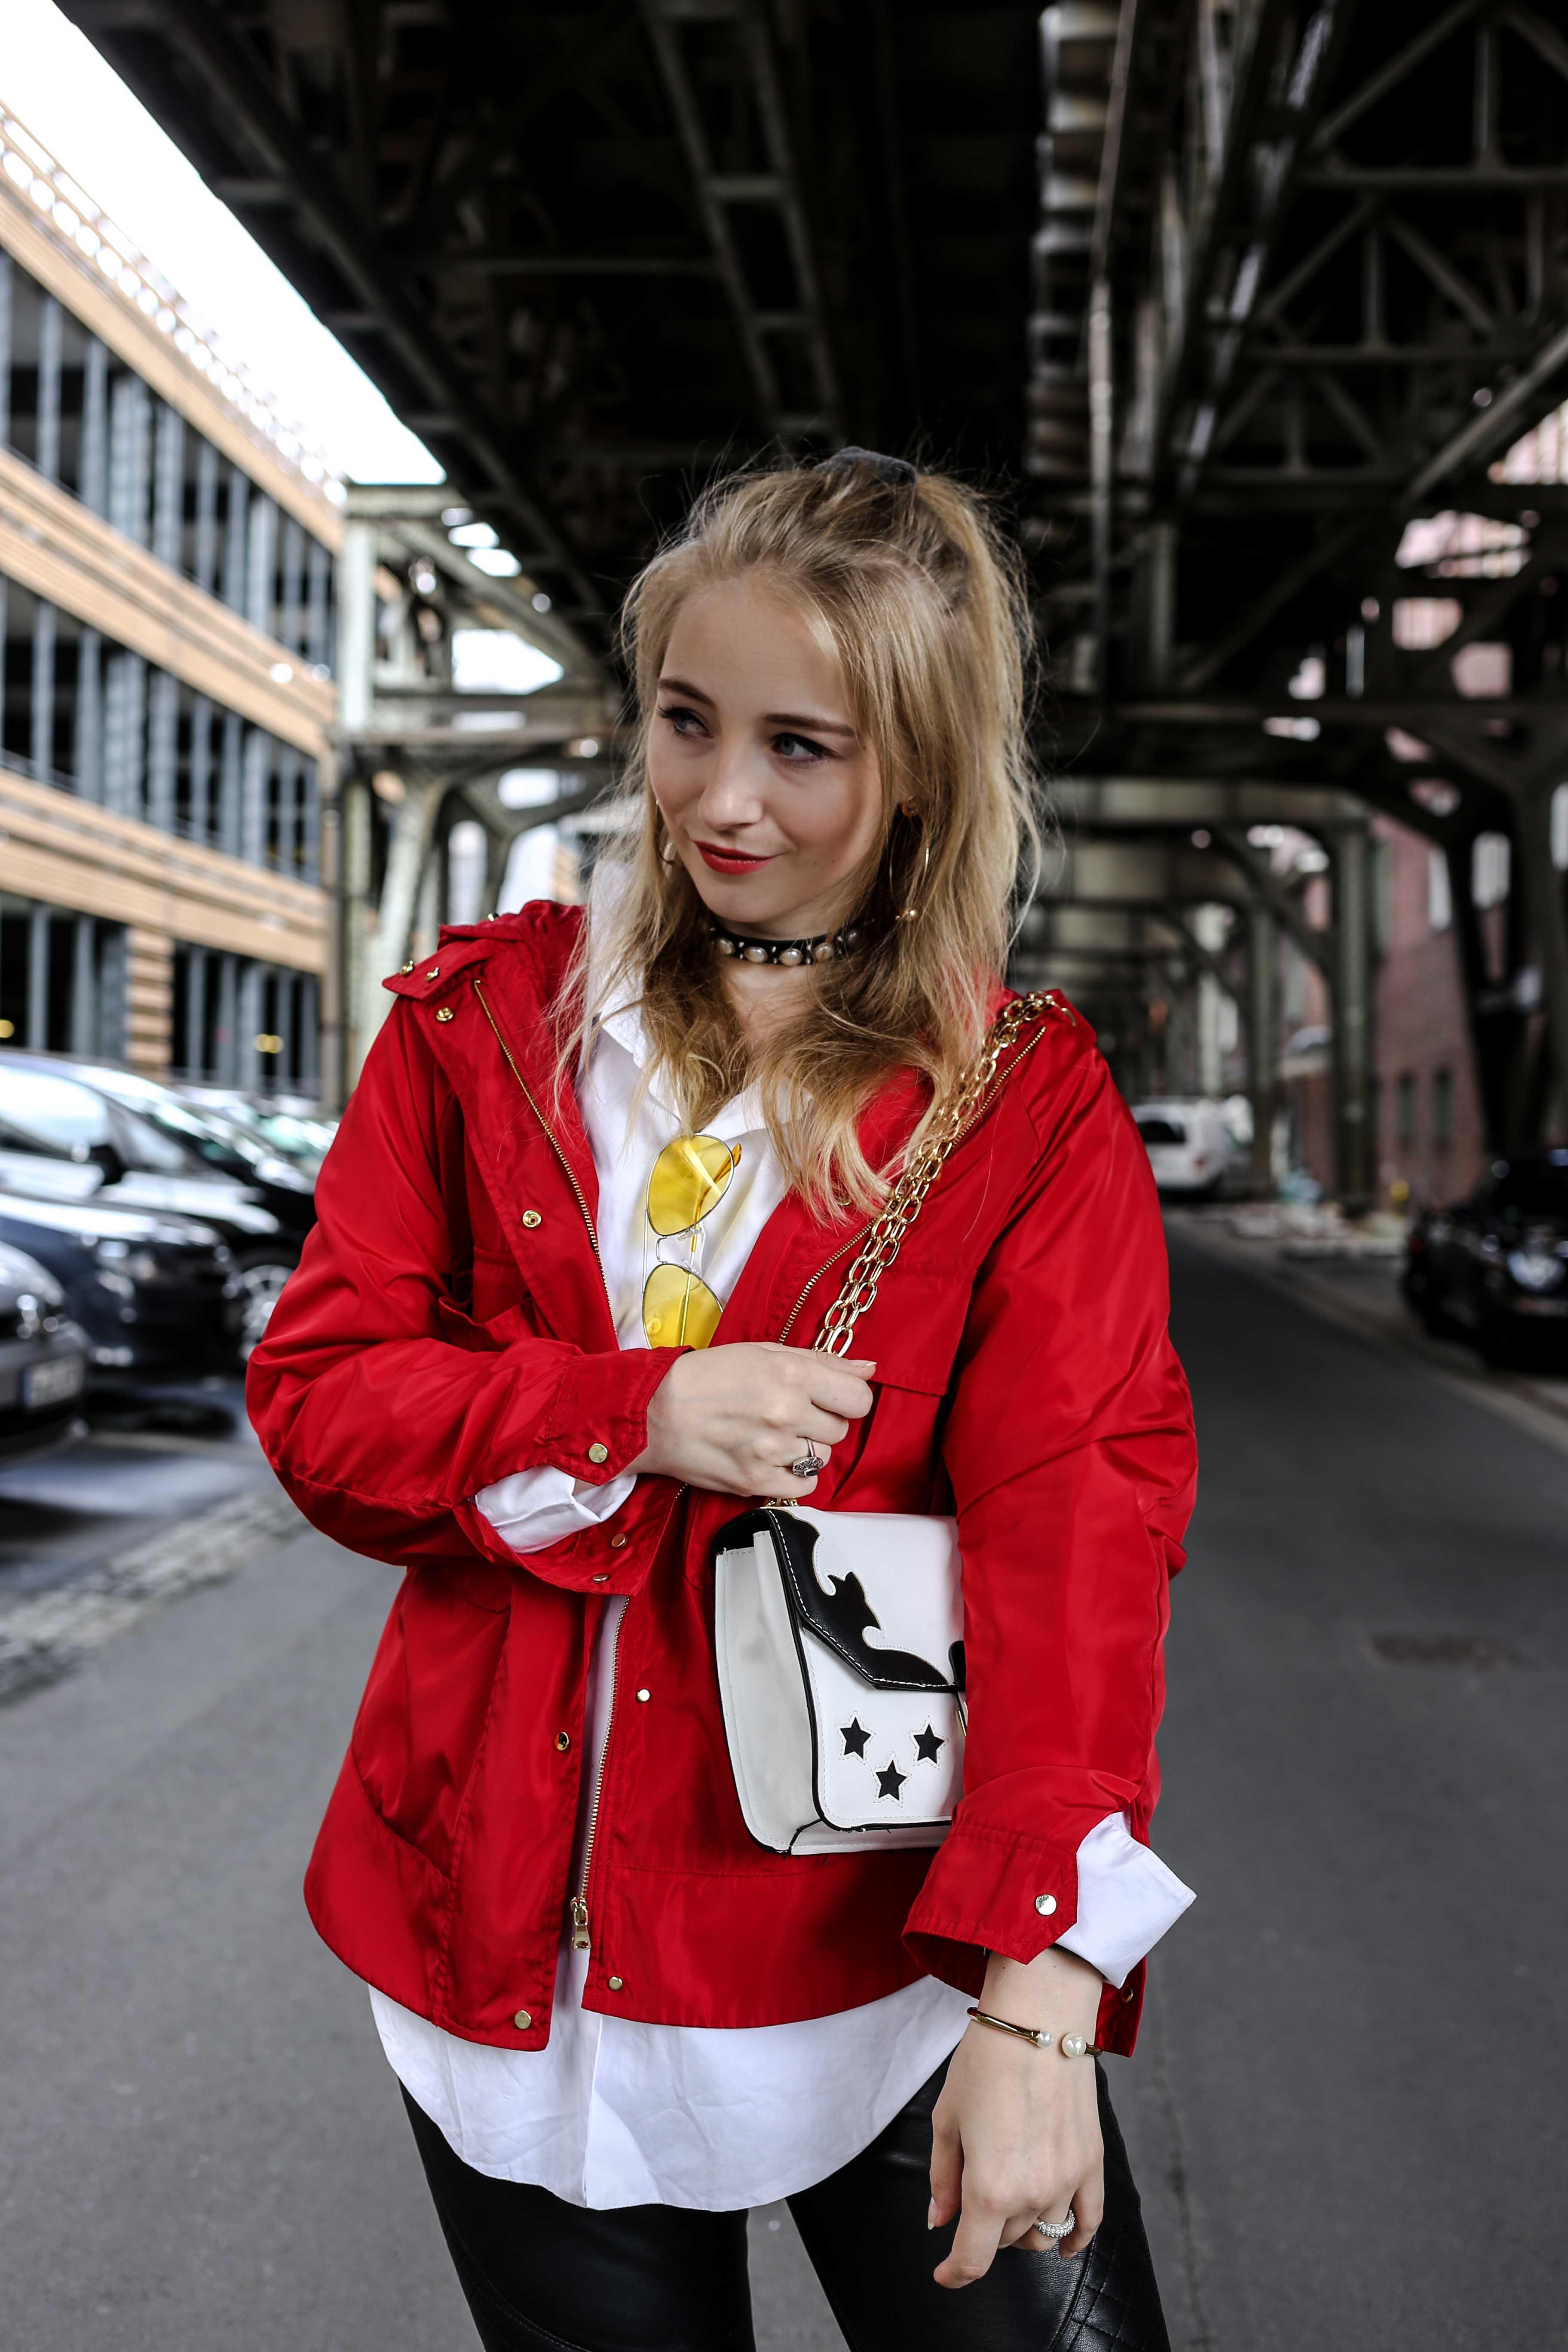 fashion-week-look-rote-regenjacke-grunge-outfit-berlin-modeblog-fashionblog_9319